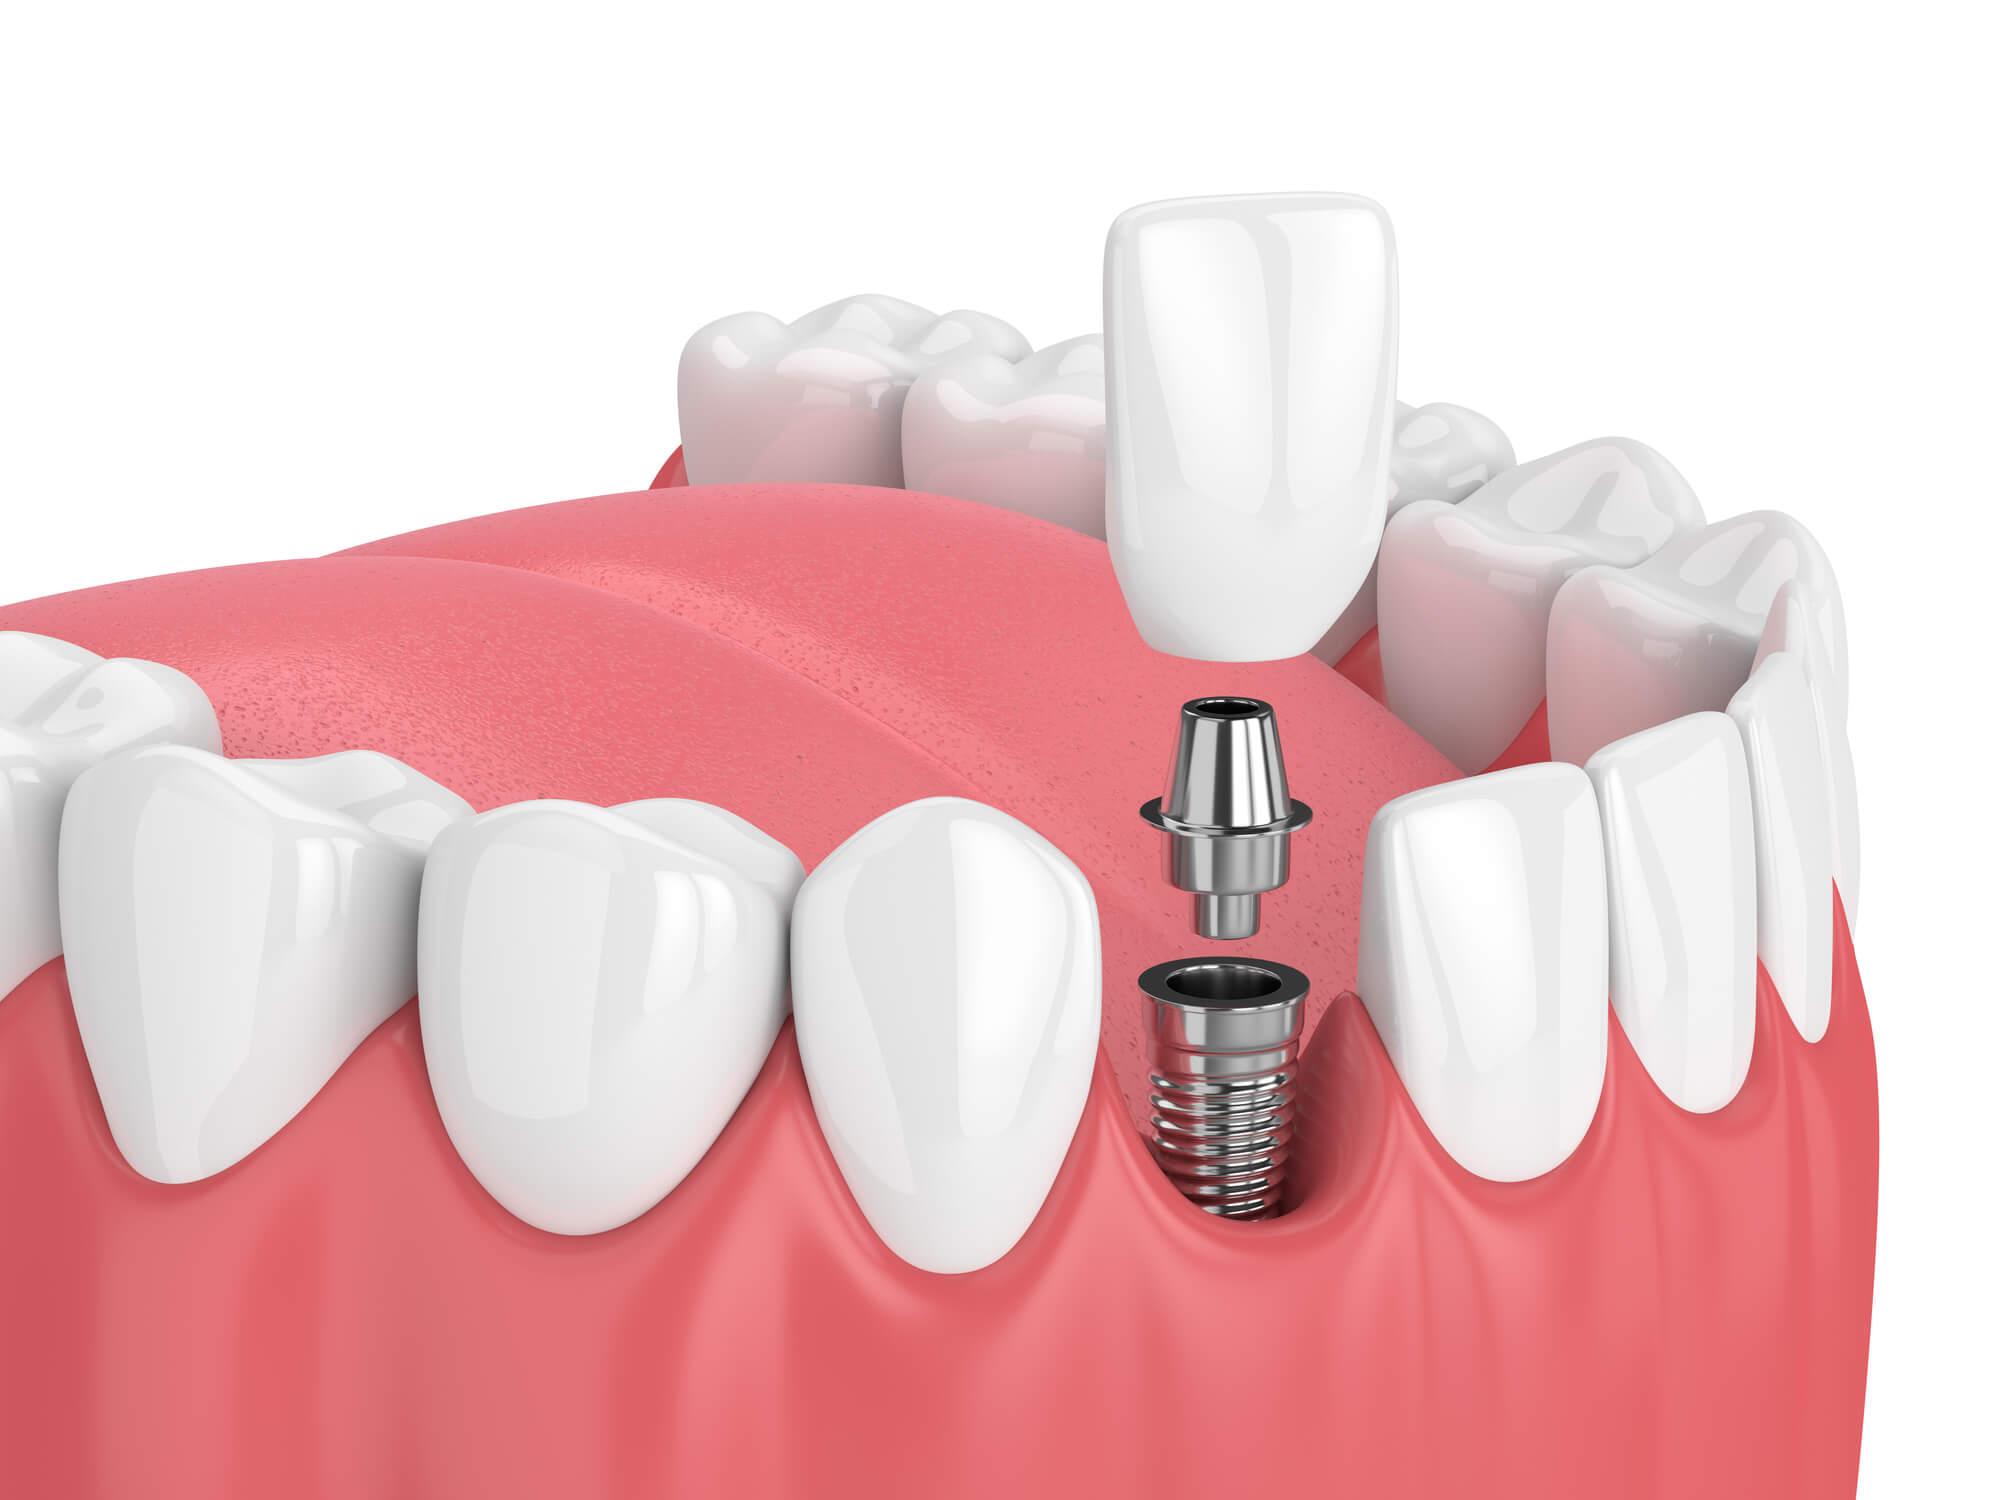 Diagram of Dental implants in everett wa.